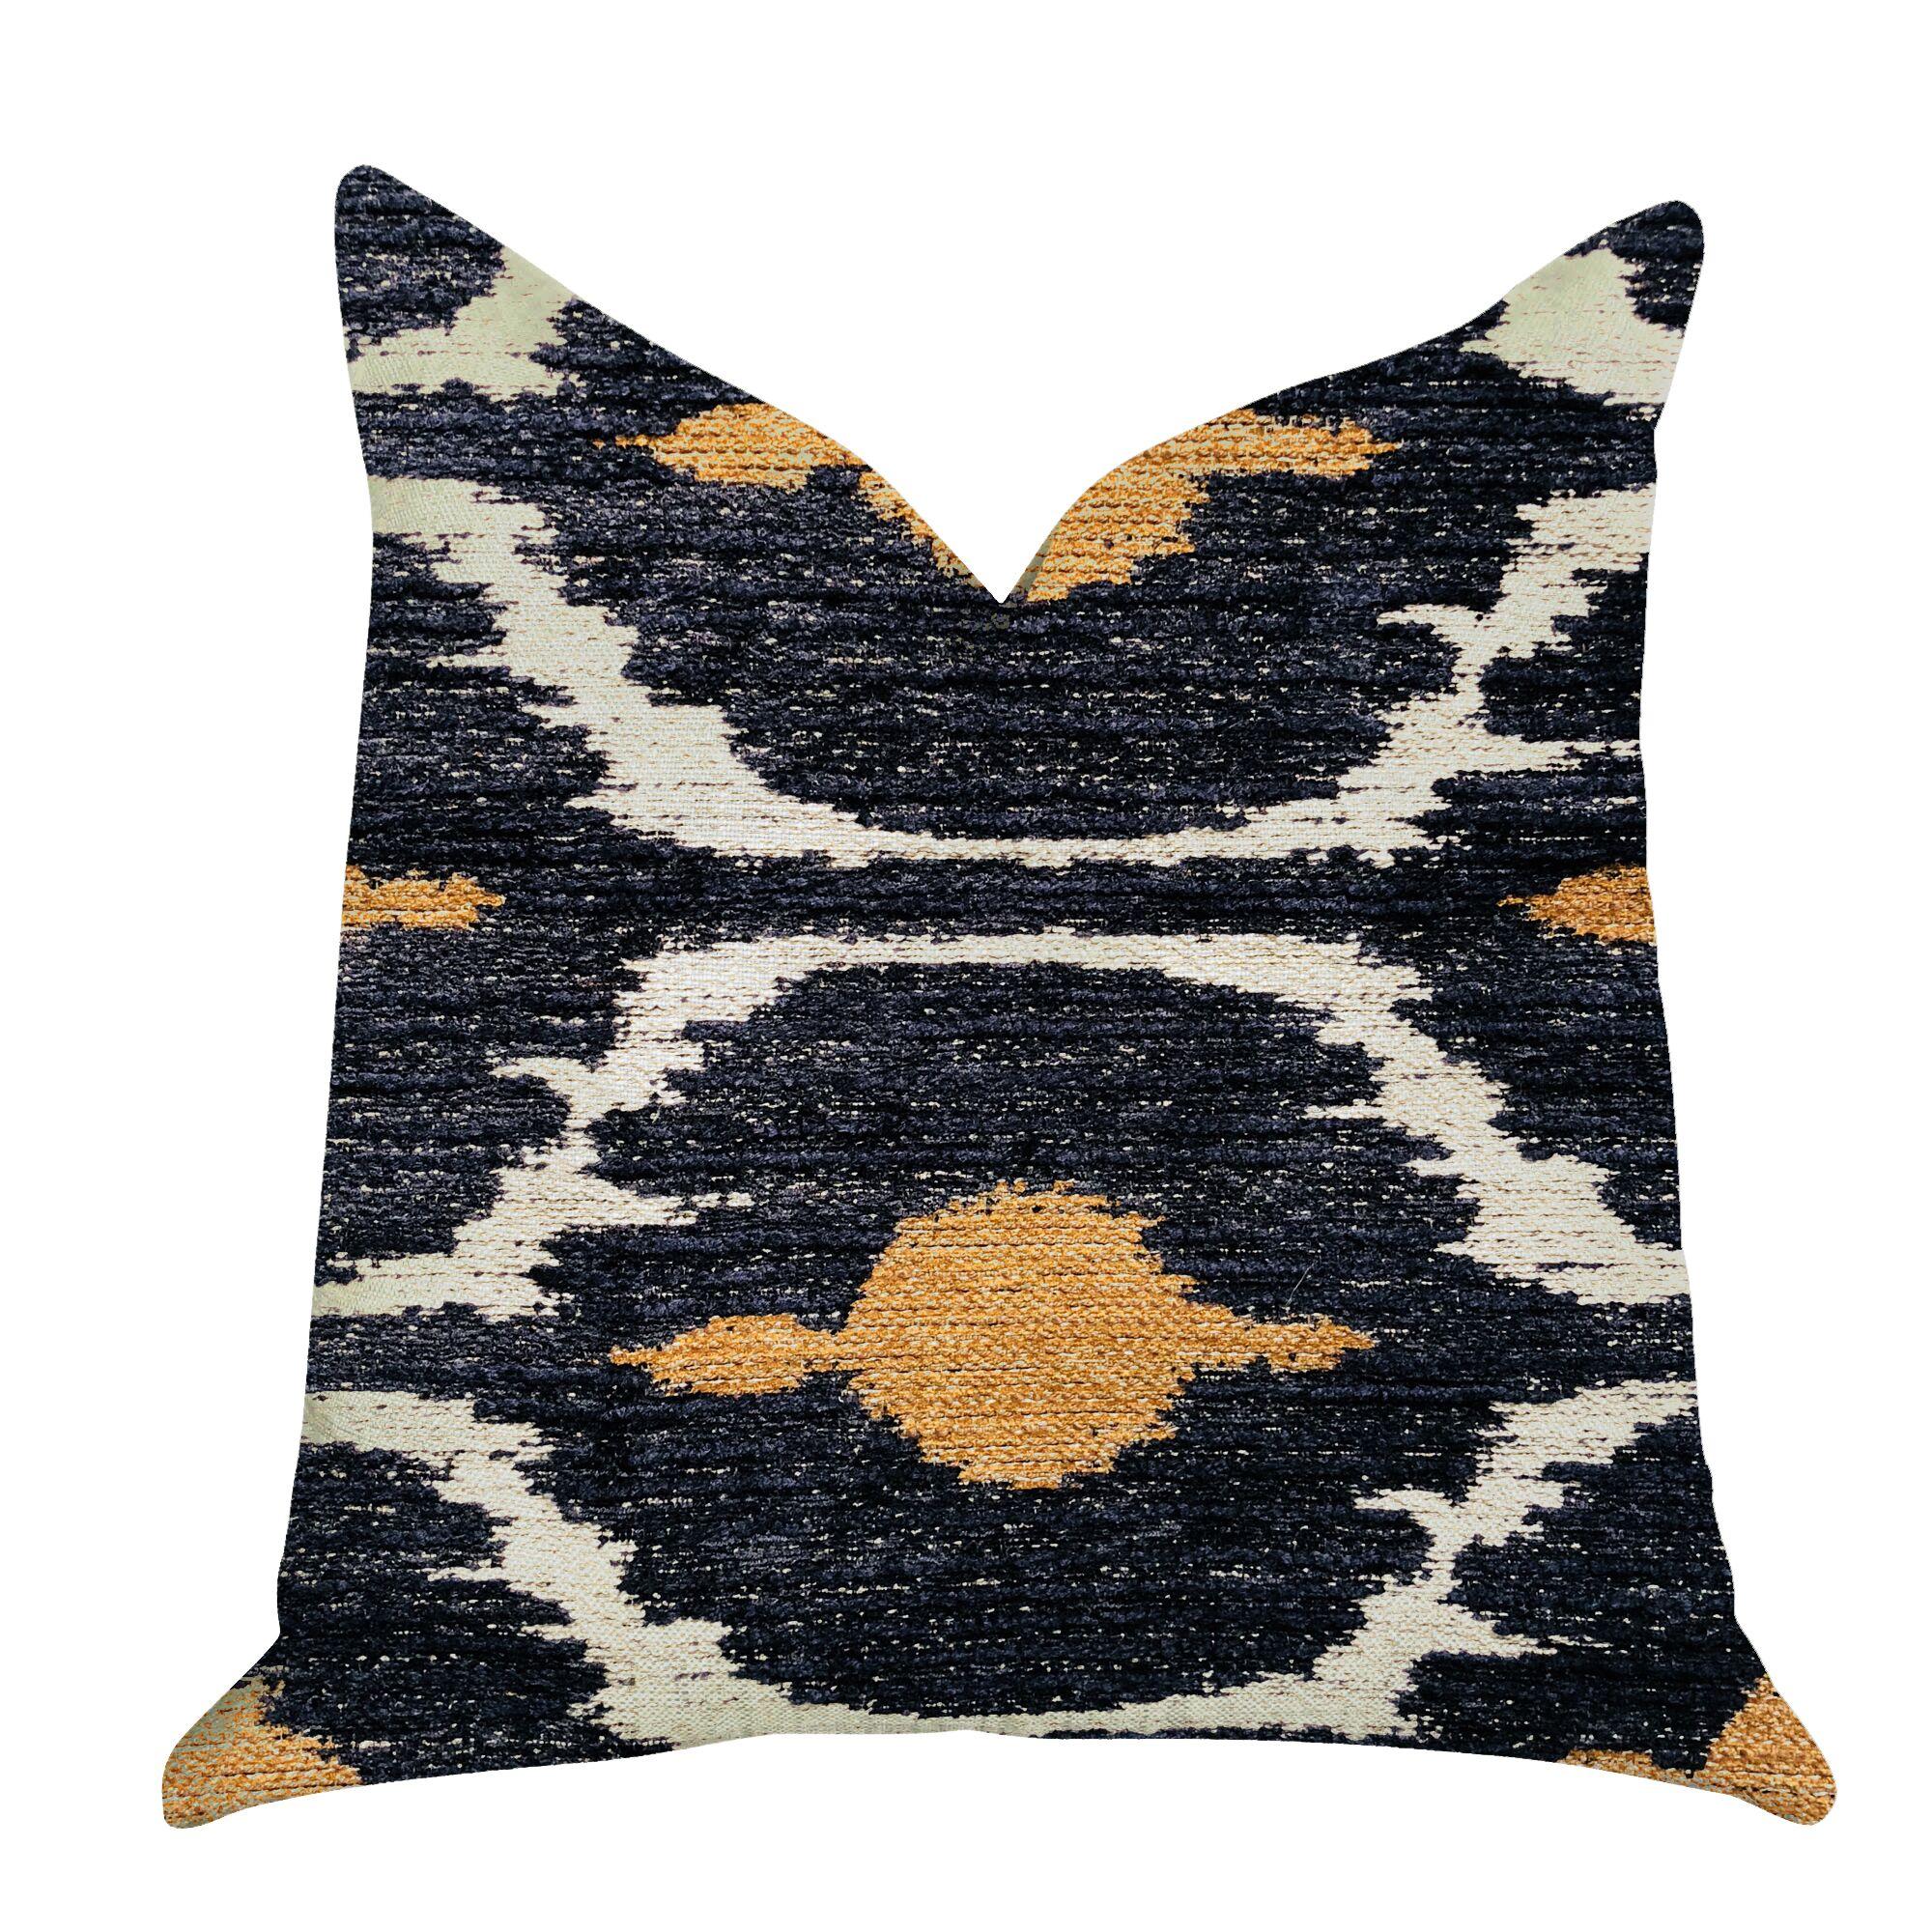 Redman Ikat Luxury Pillow Size: 16